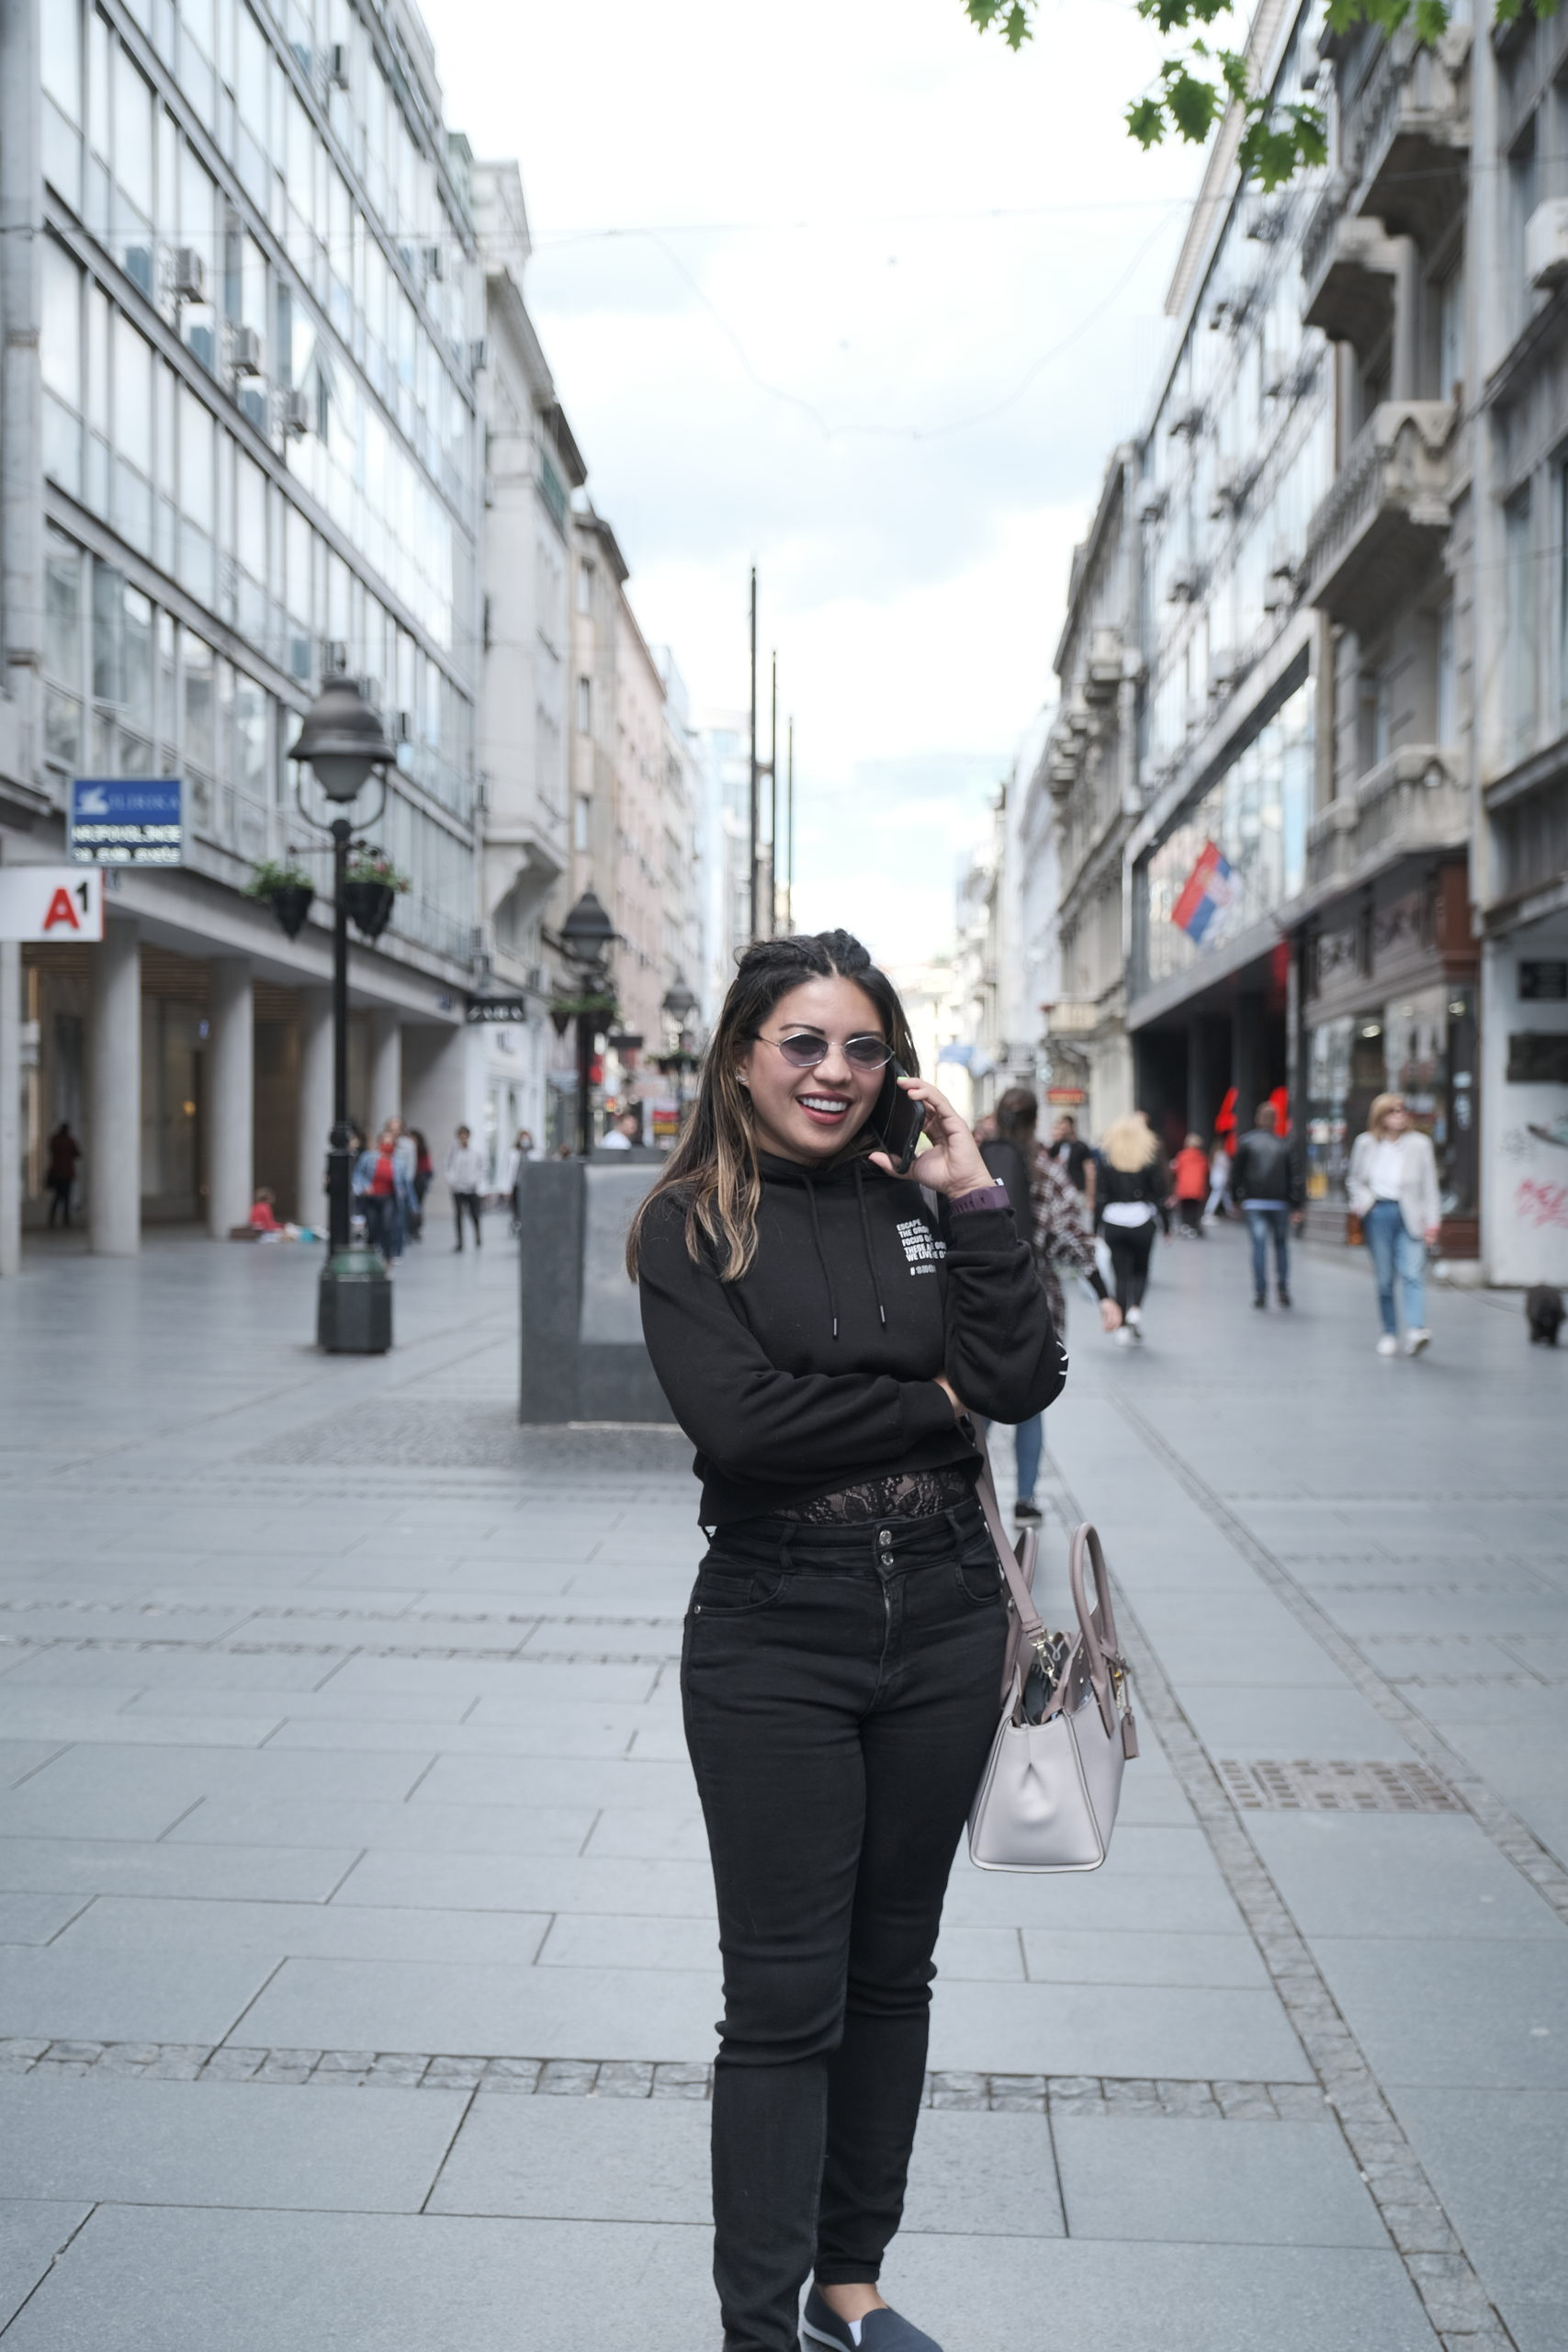 Mark Hotel Belgrade The Best Place for Digital Nomads Visiting Belgrade, Serbia